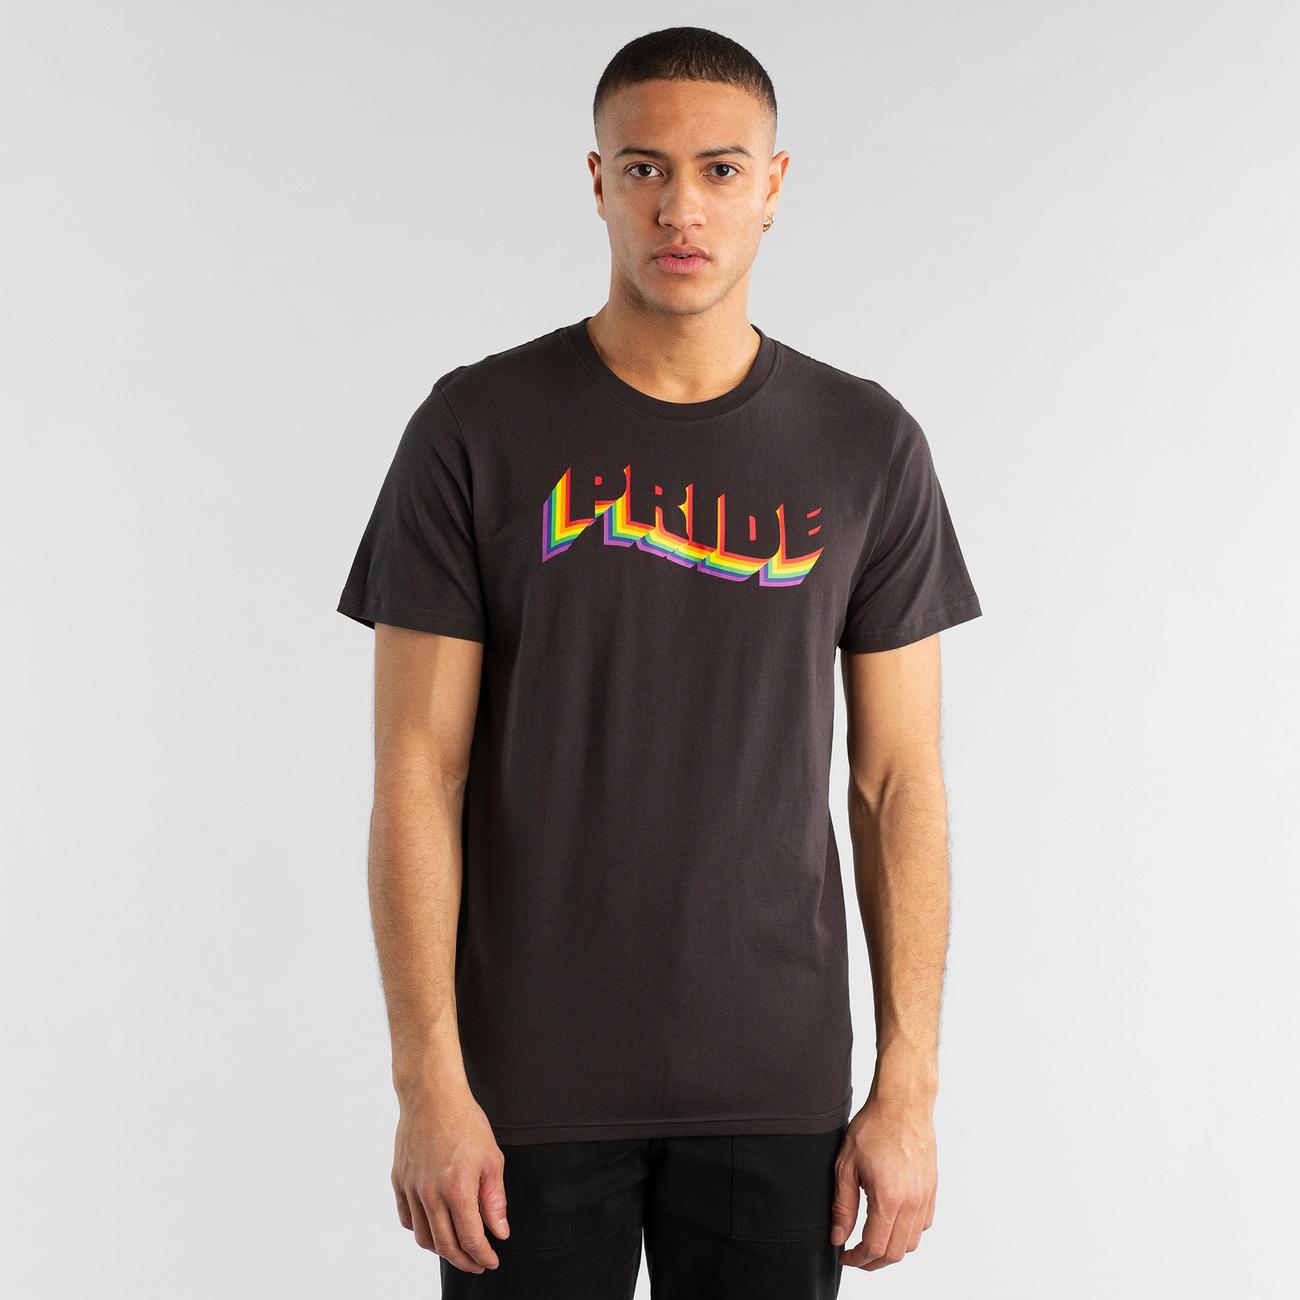 T-shirt Stockholm Pride Flag Charcoal